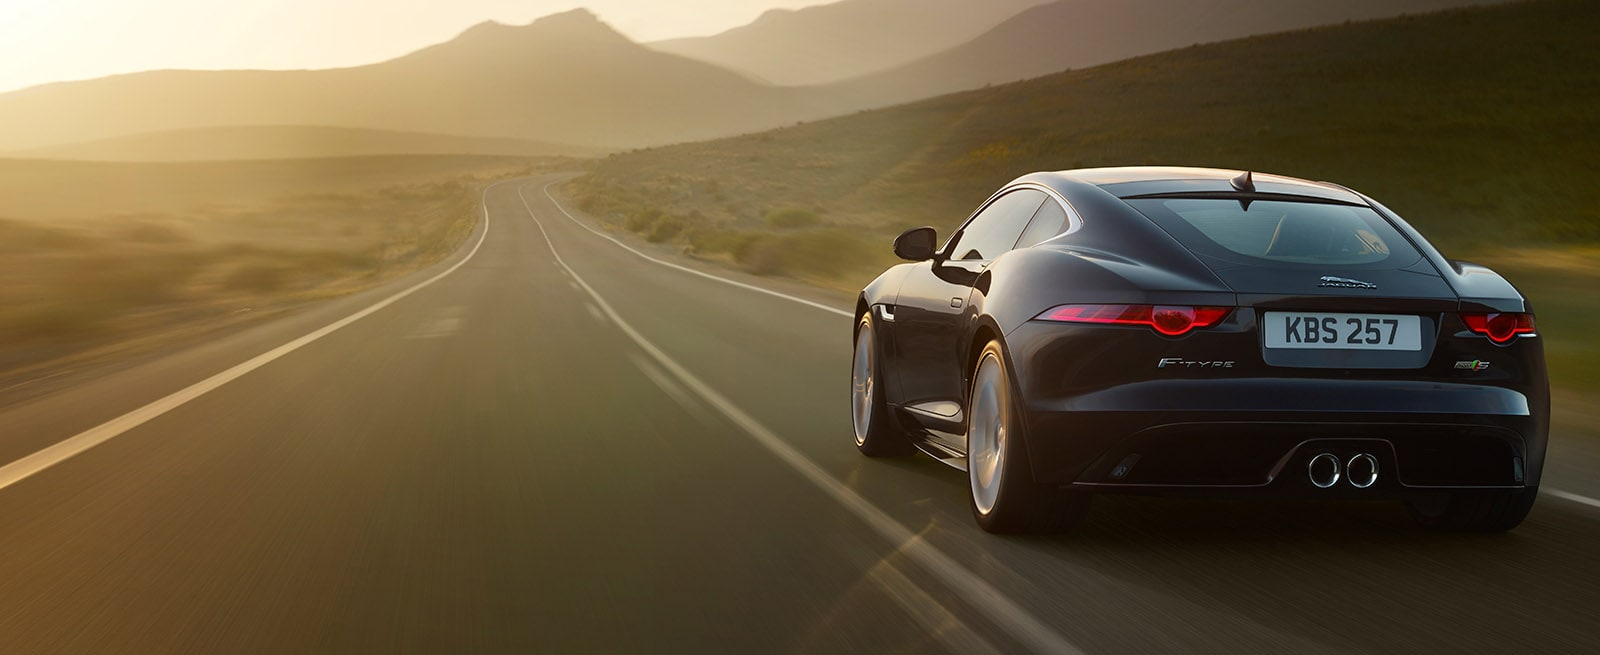 A Black Jaguar F-Type Driving Down A Desert Road